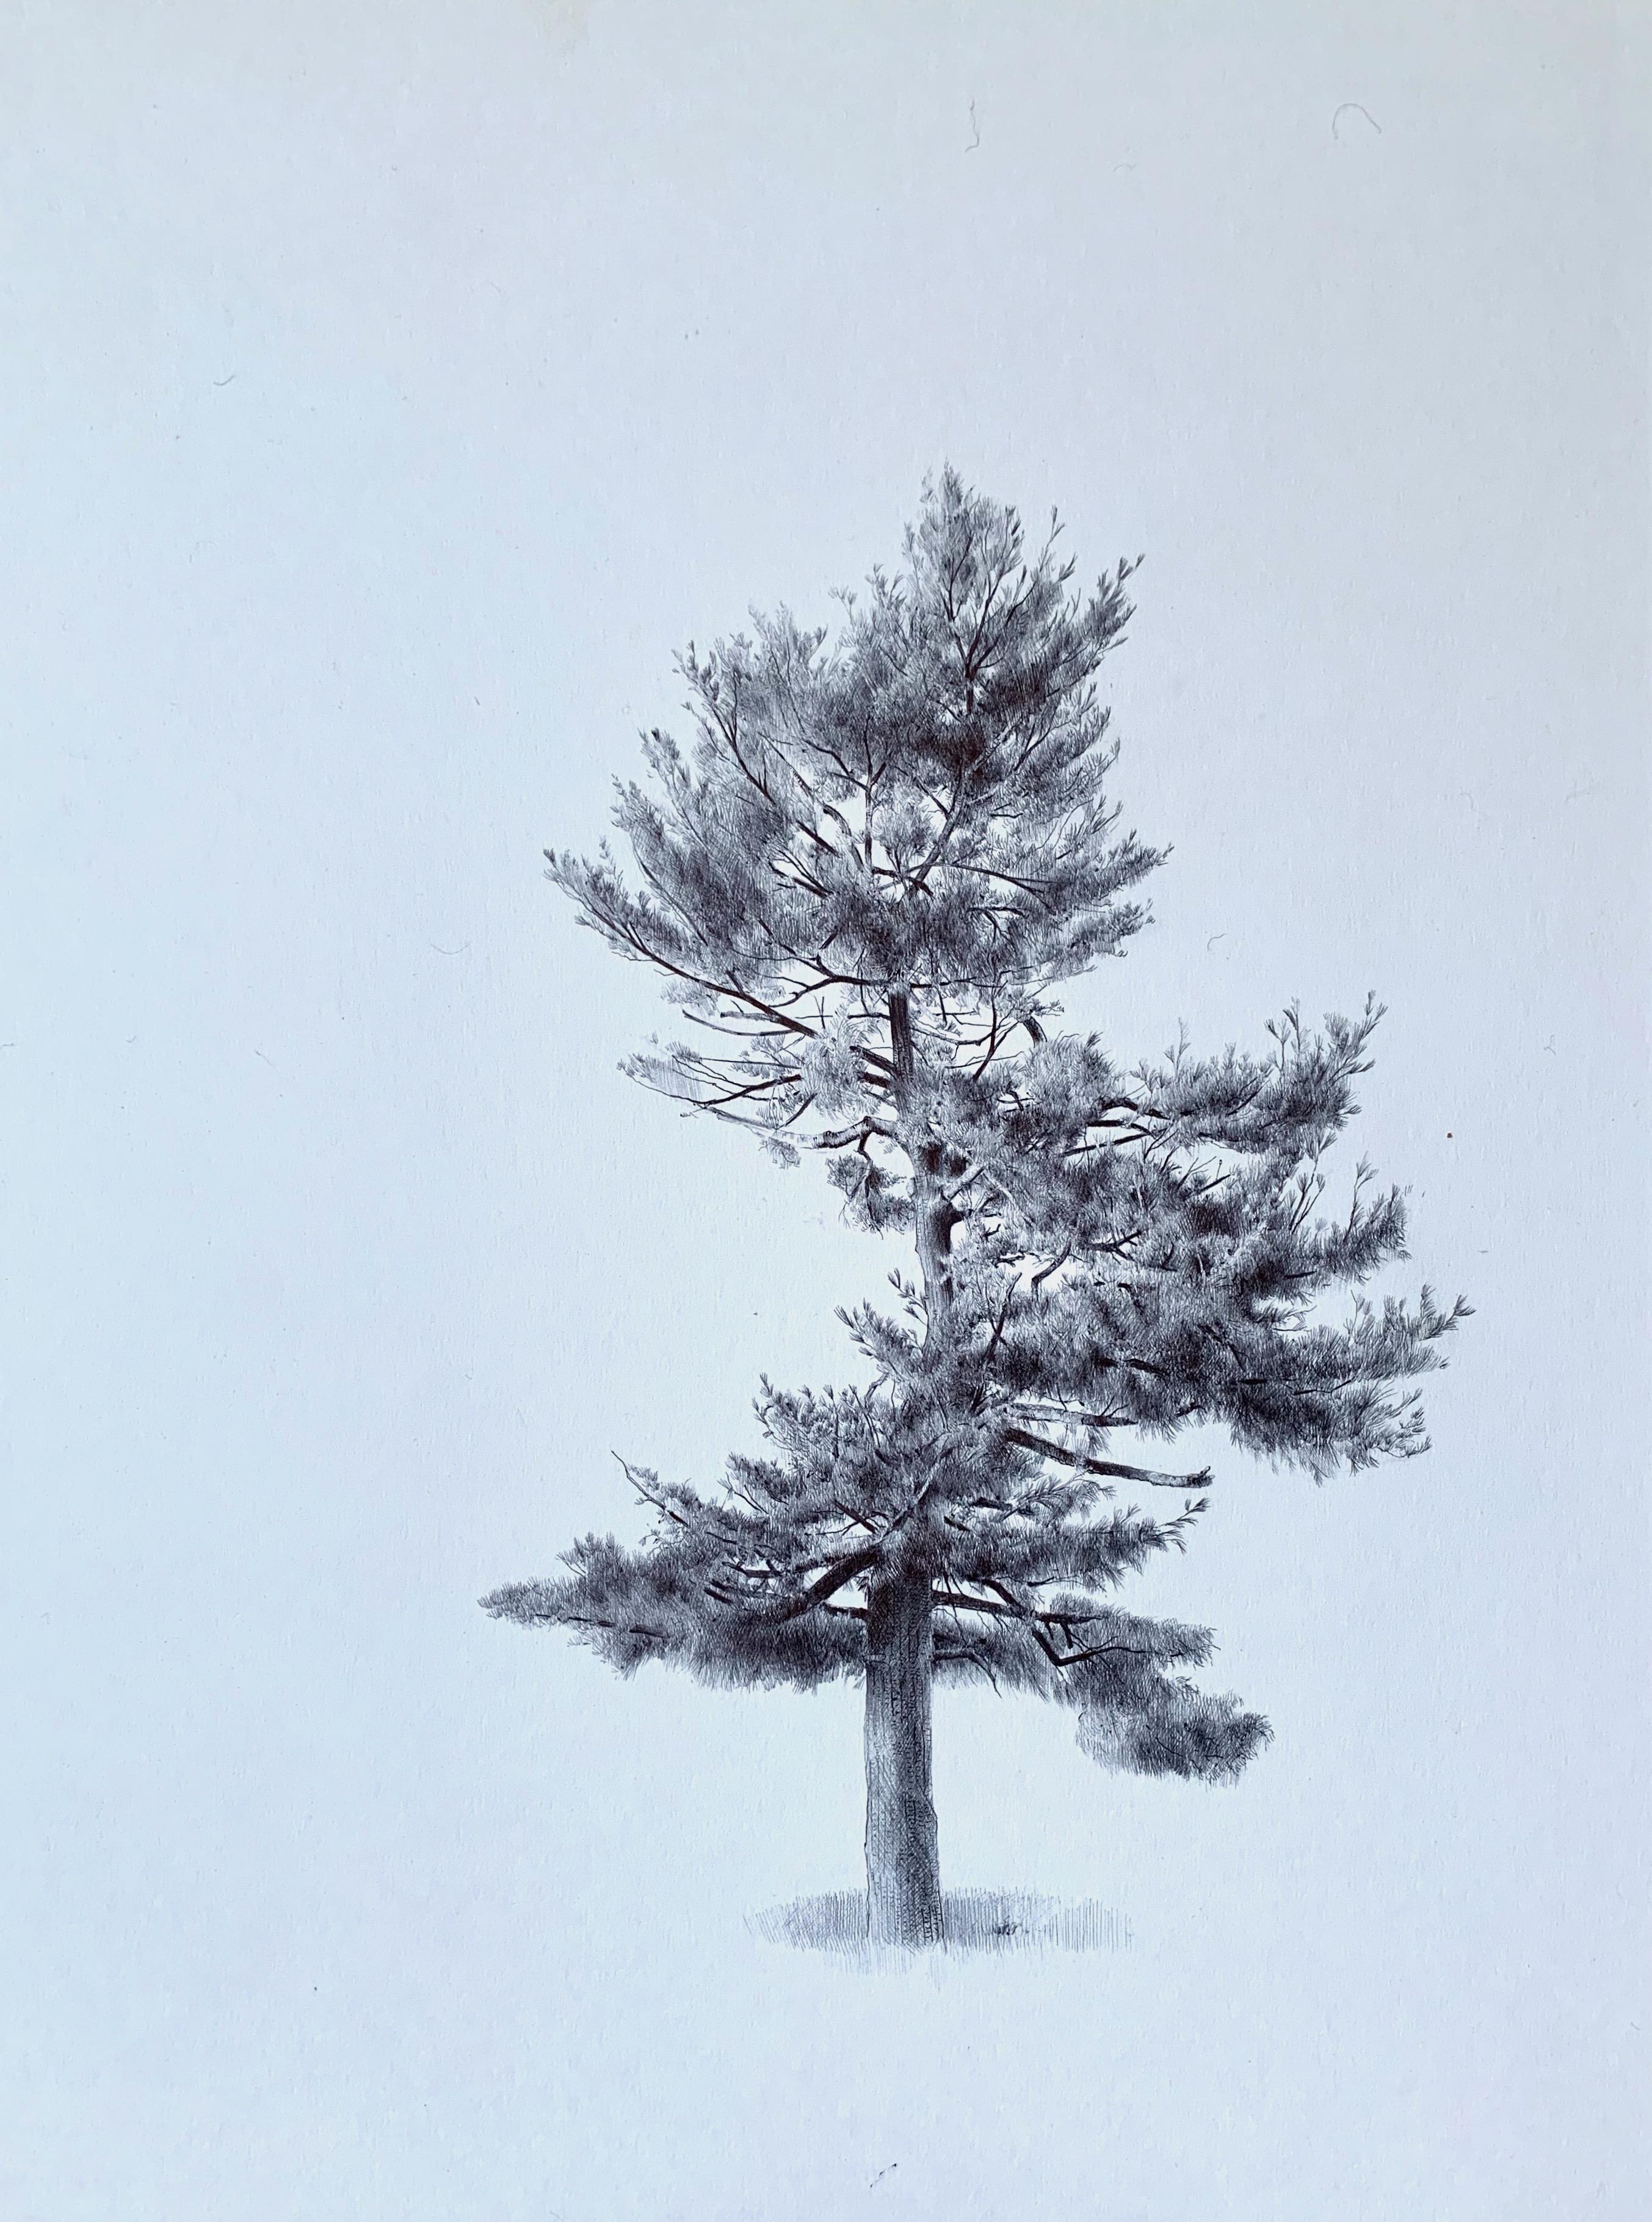 Untitled (Spiraling Tree), realist ballpoint pen still life drawing, 2020